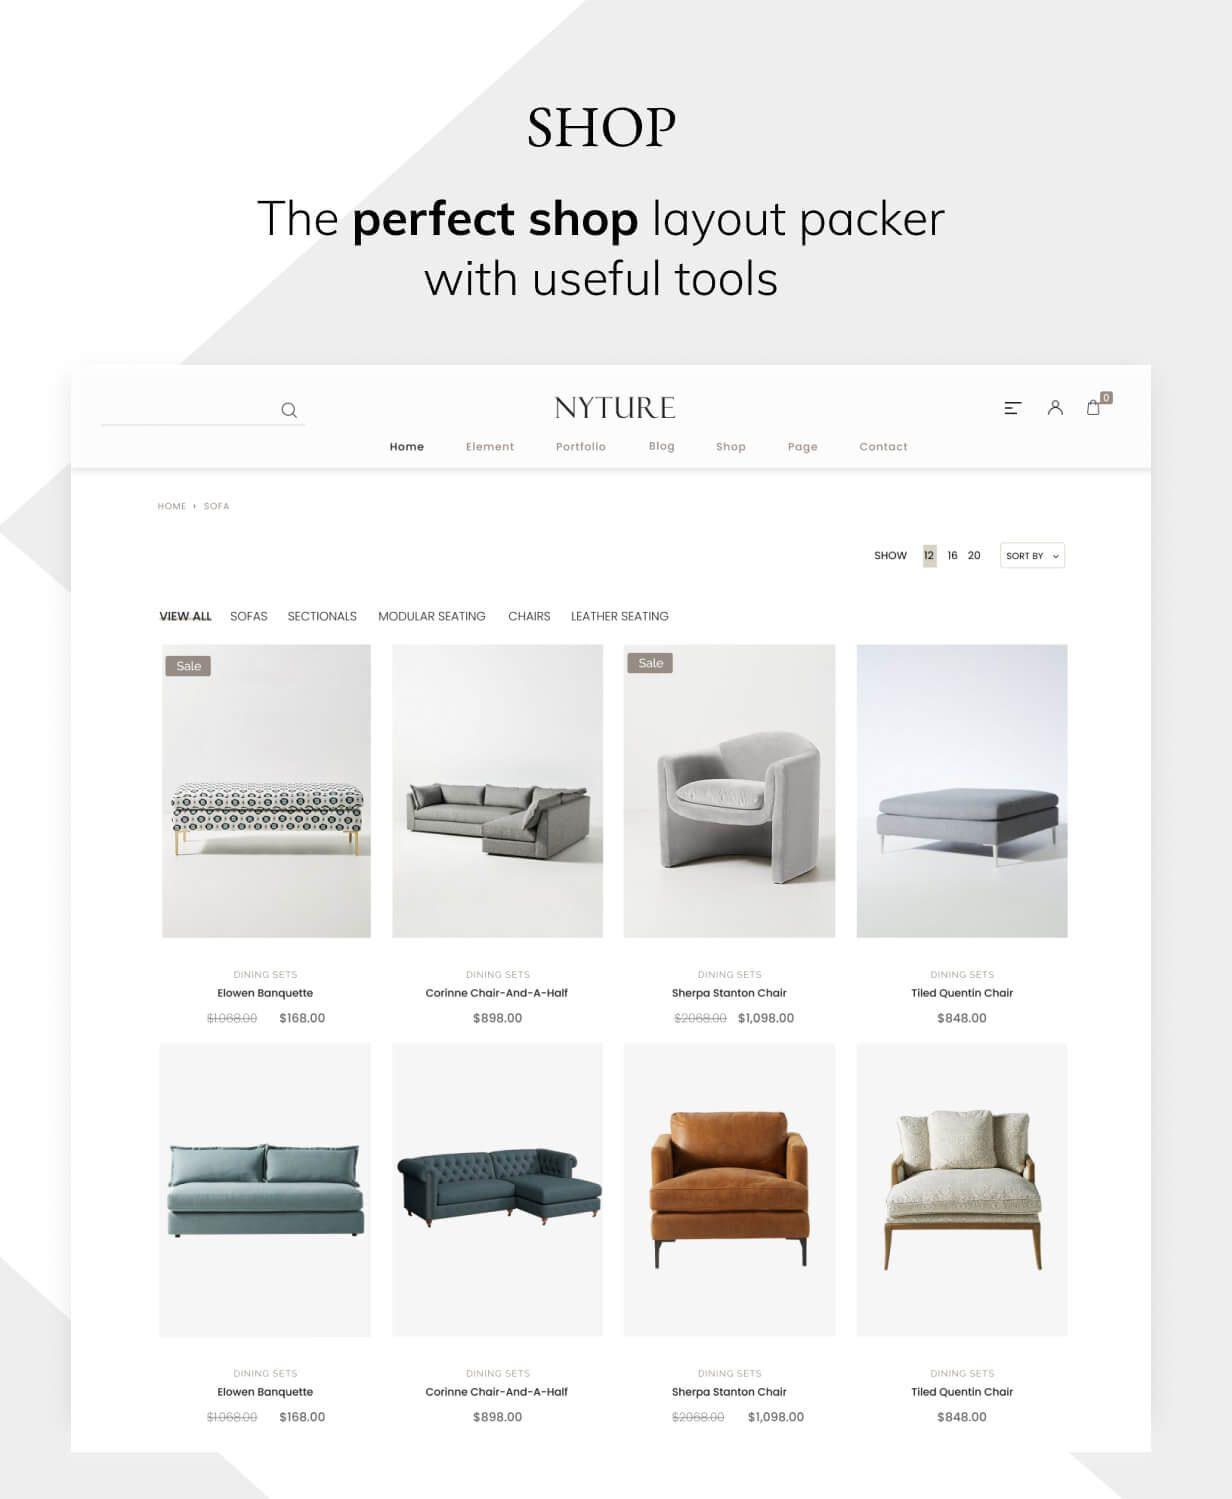 قالب Nyture   ❤️ قالب وردپرس Nyture   قالب فروشگاهی نایچر